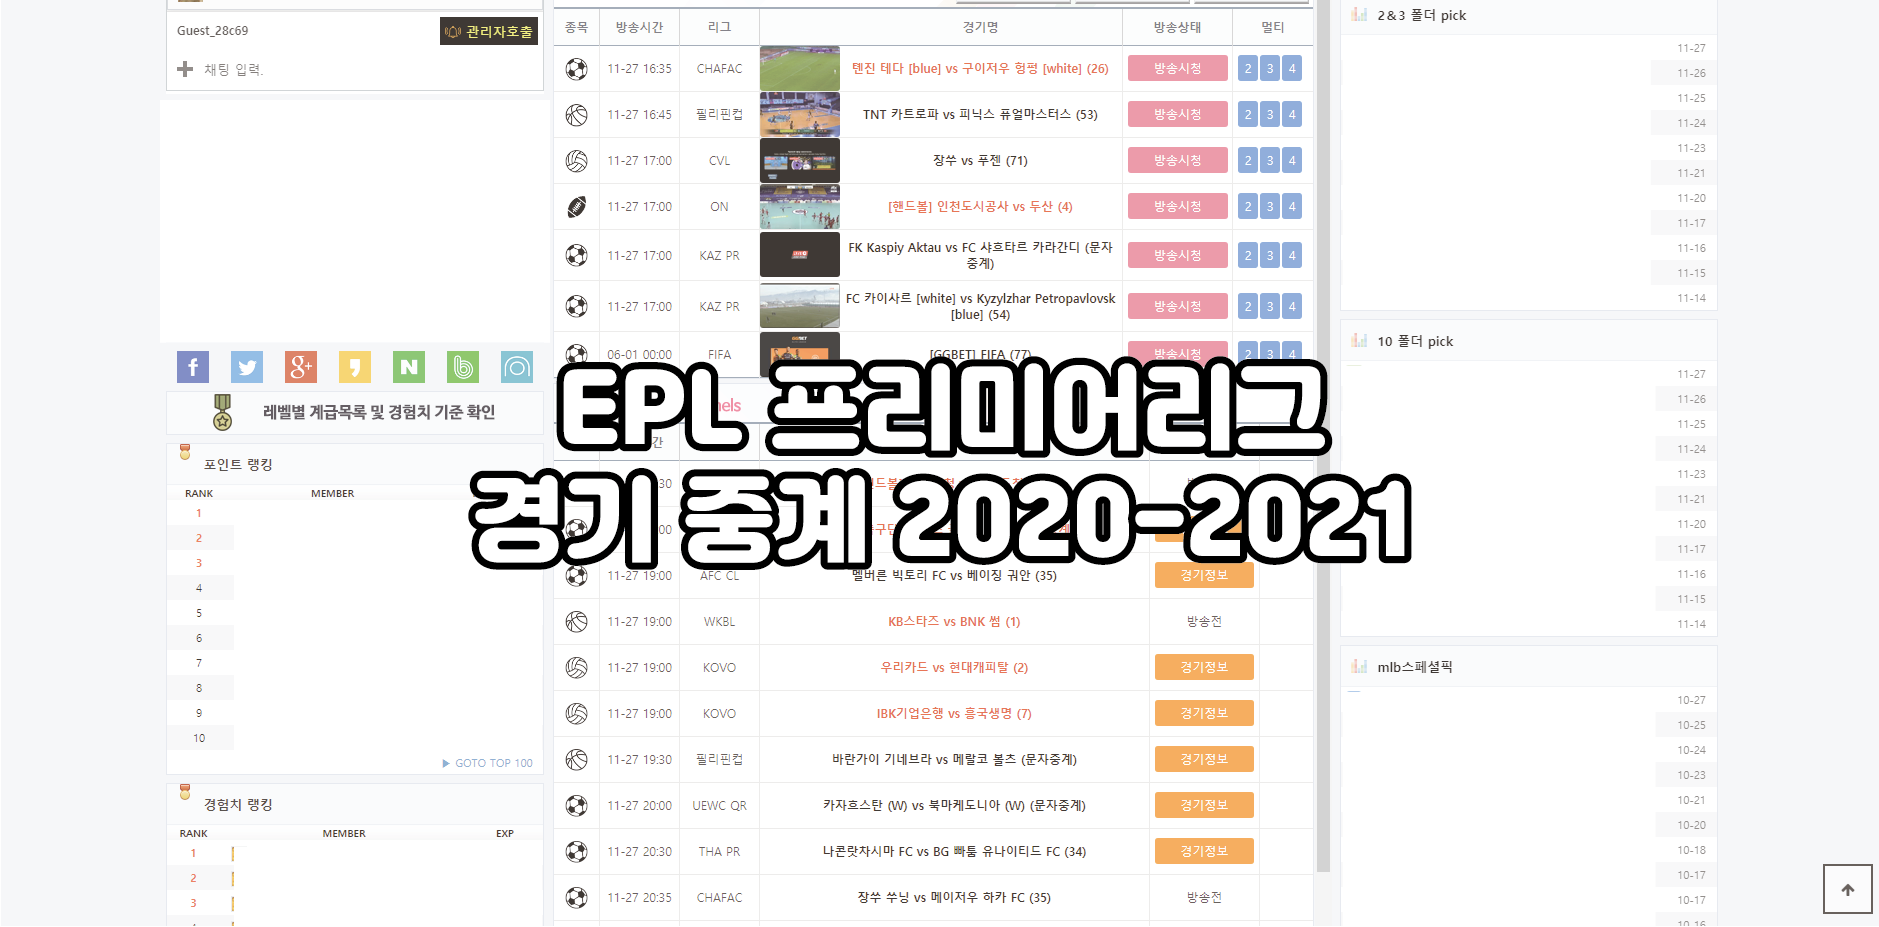 EPL 프리미어리그 경기 중계 2020-2021